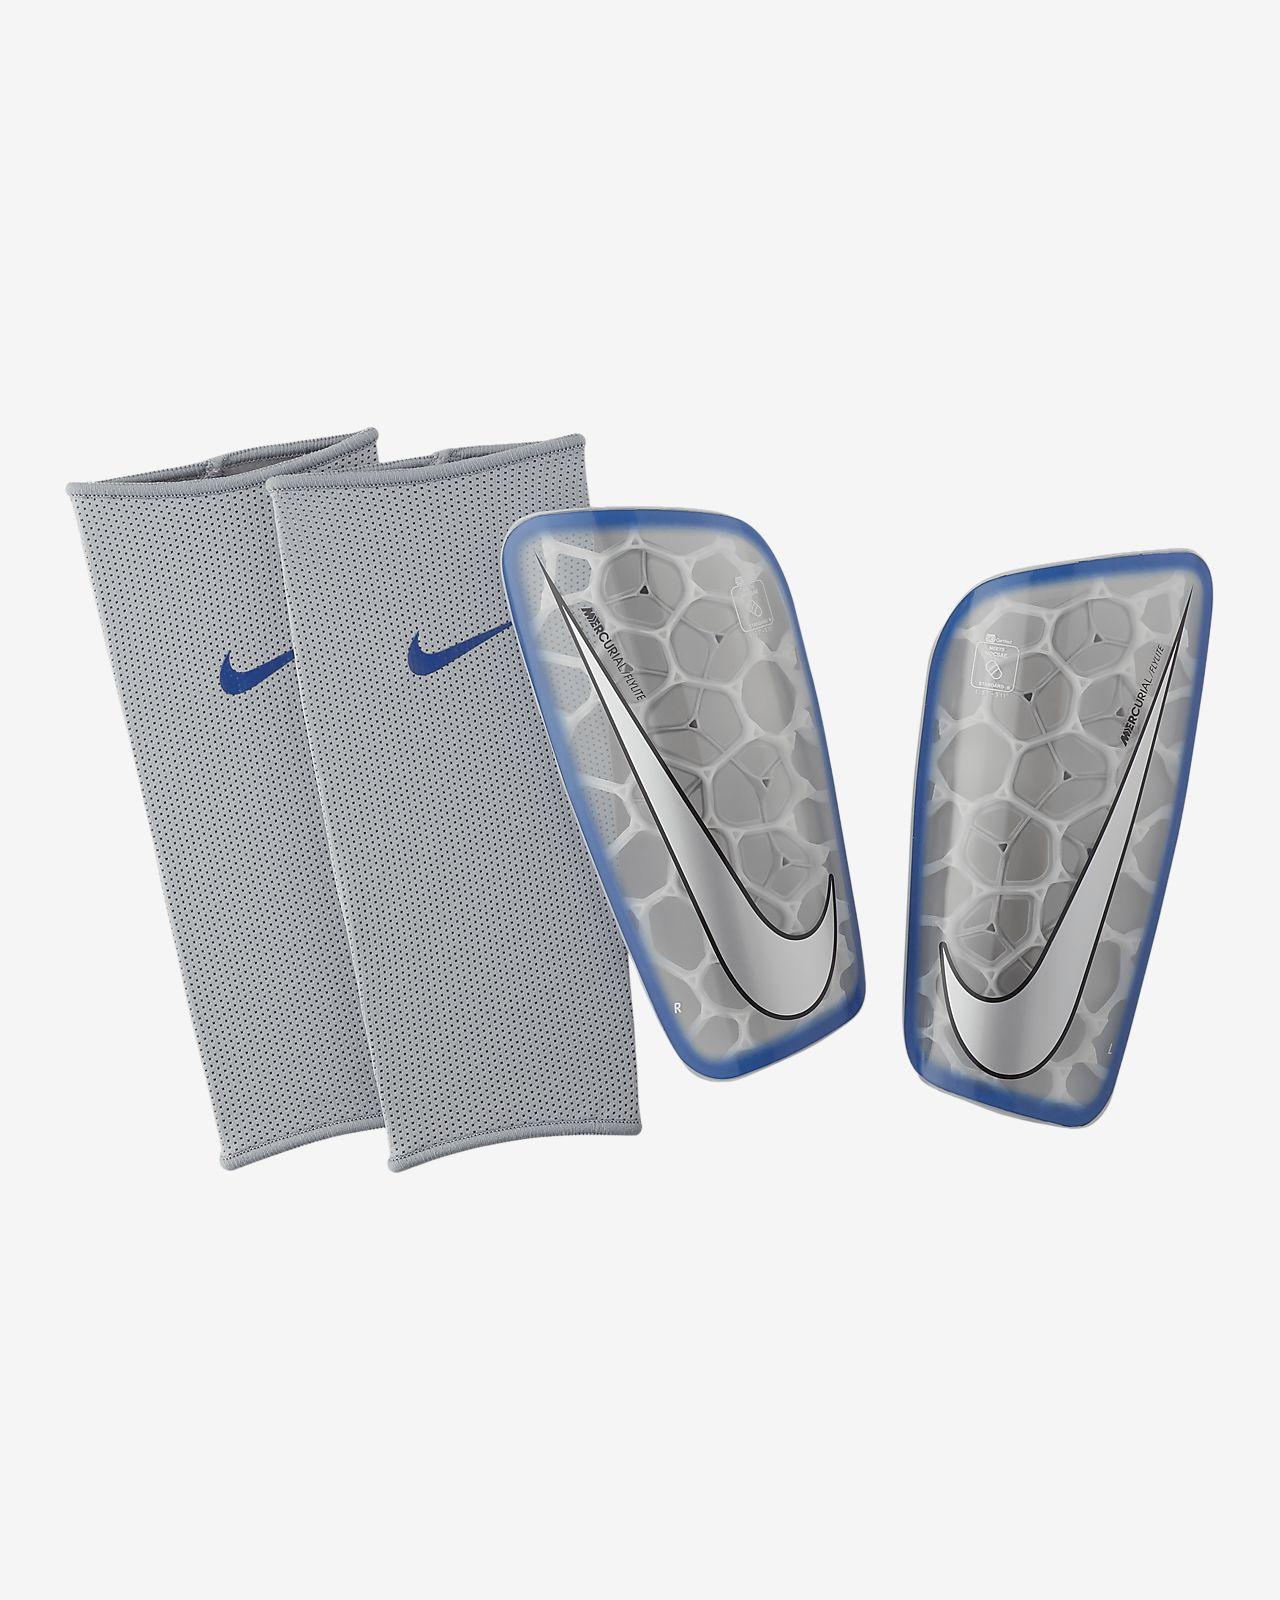 Nike Mercurial Flylite Futbol Tekmelikleri